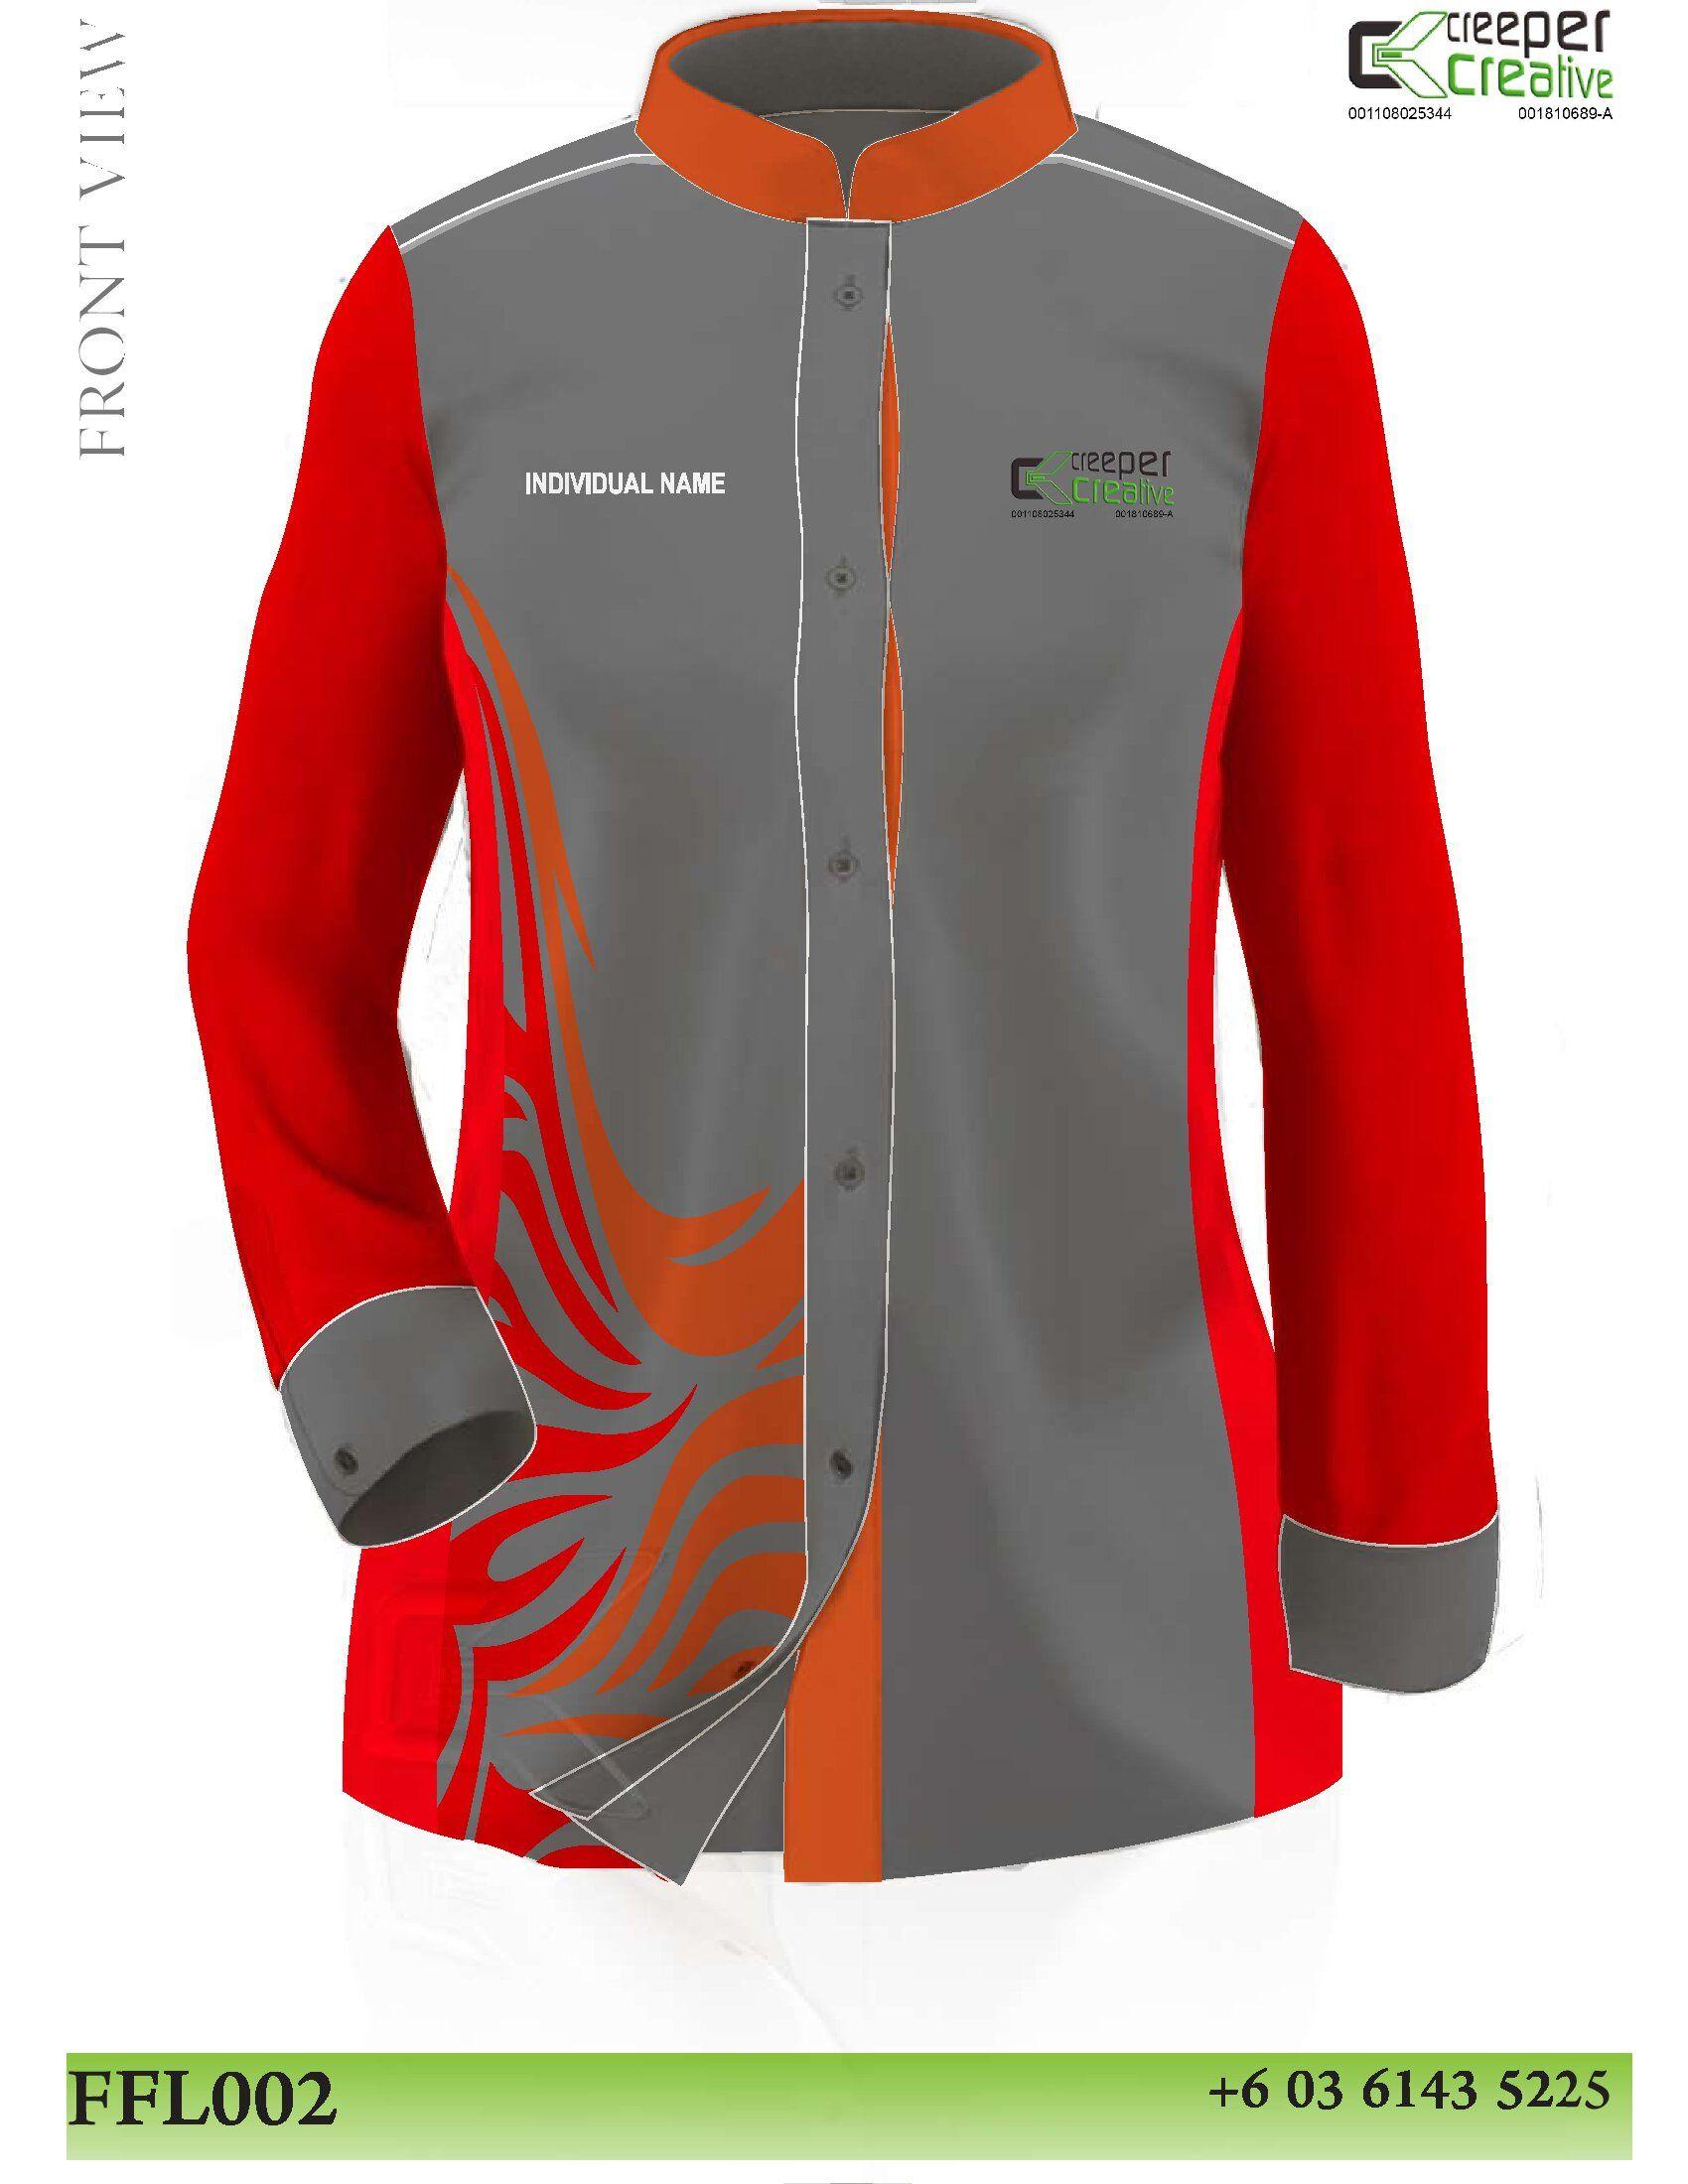 Uniform Design Malaysia Corporate Shirts Uniform Design Shirt Designs